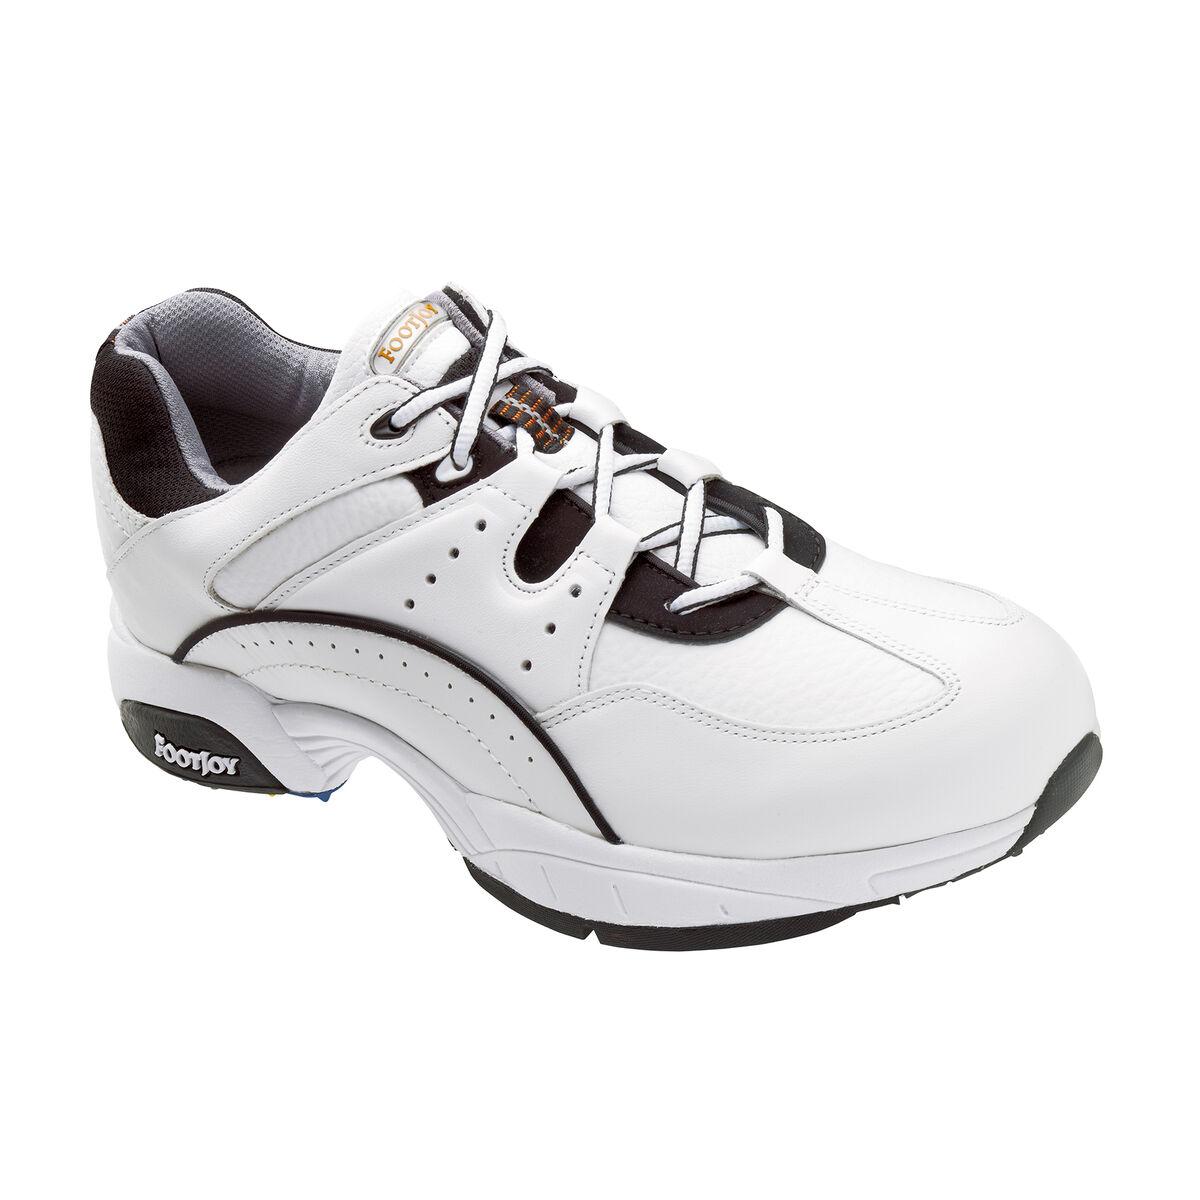 7017b27a FootJoy Golf Athletic Superlites Men's Golf Shoe: FootJoy Men's Golf ...